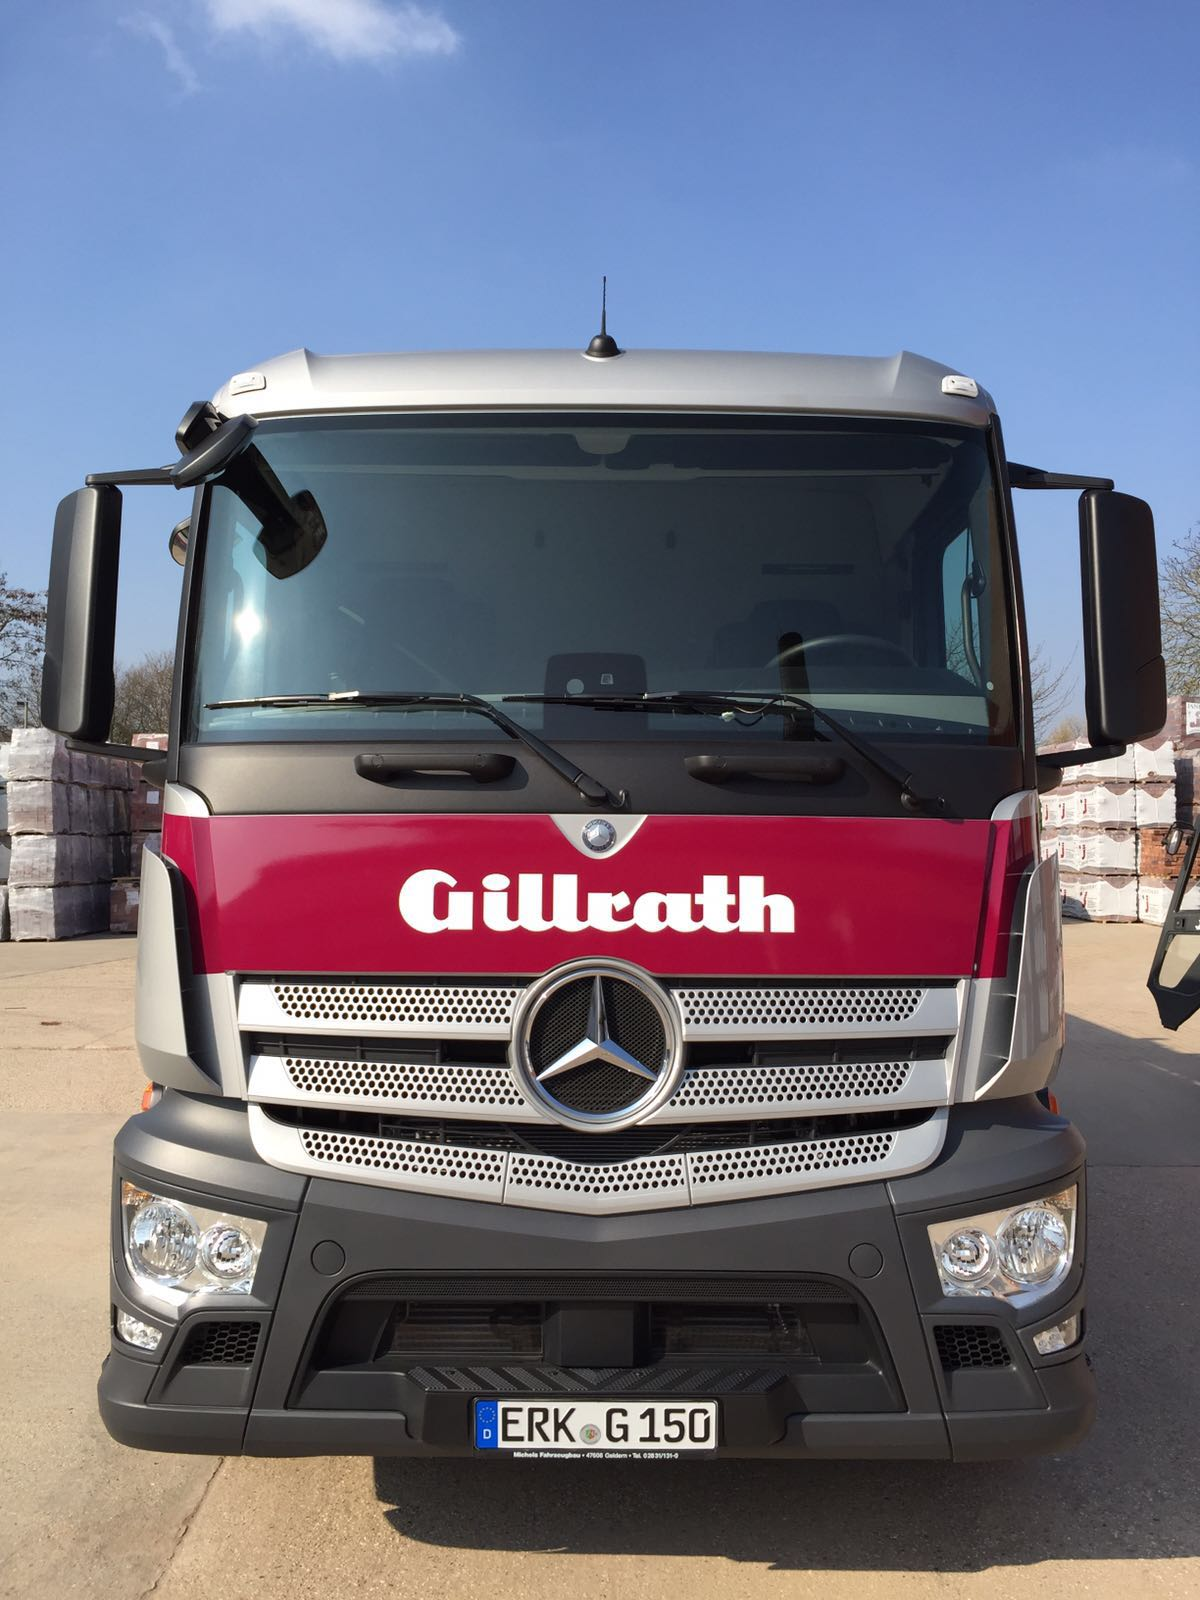 gillrath-lkw-front